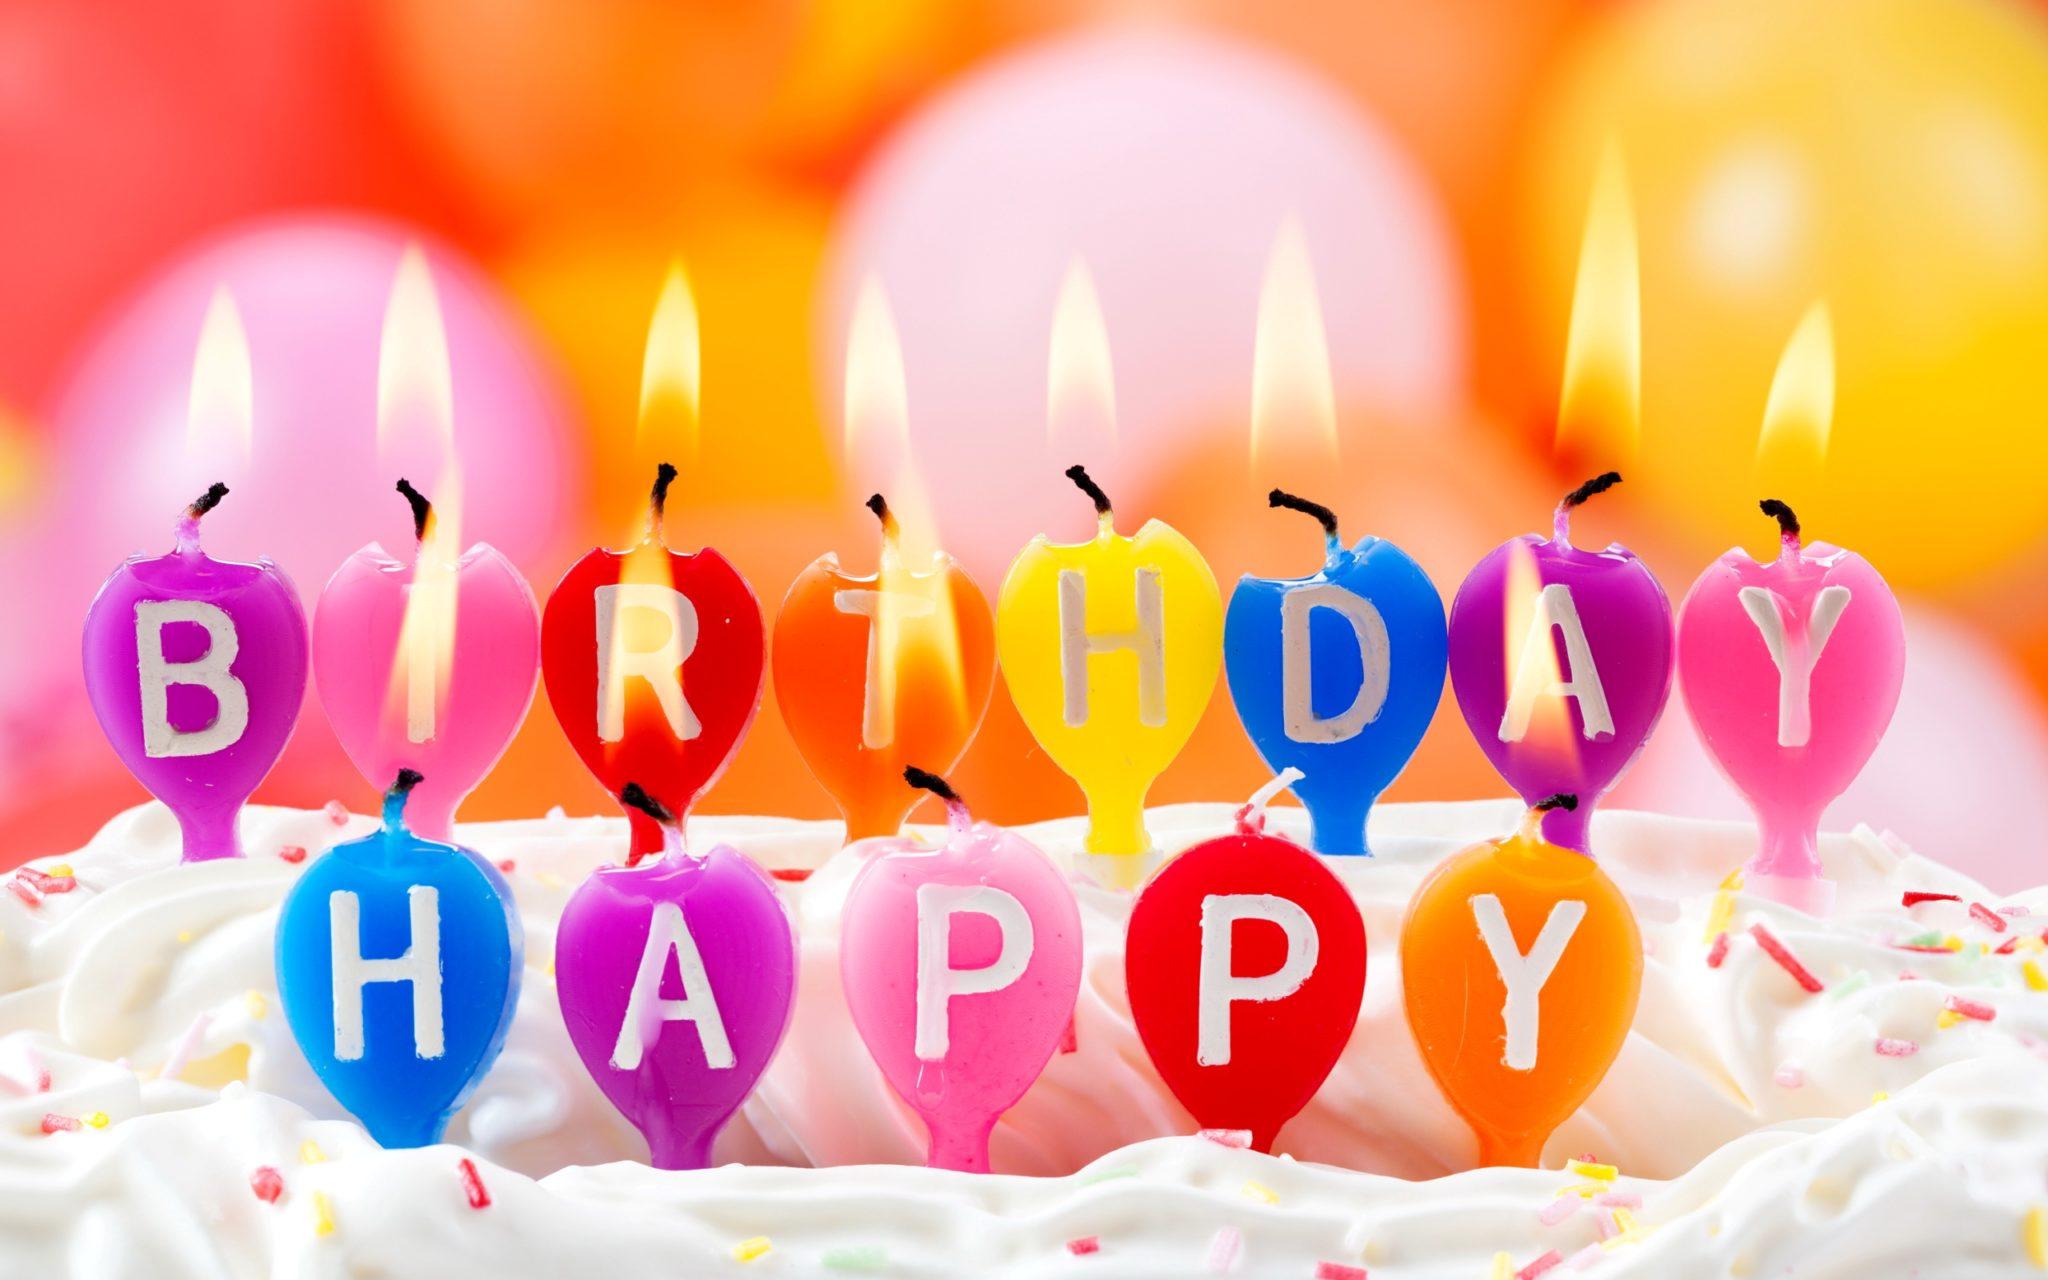 Happy Birthday Dear Friend Pravarsha Ode To A Disqus